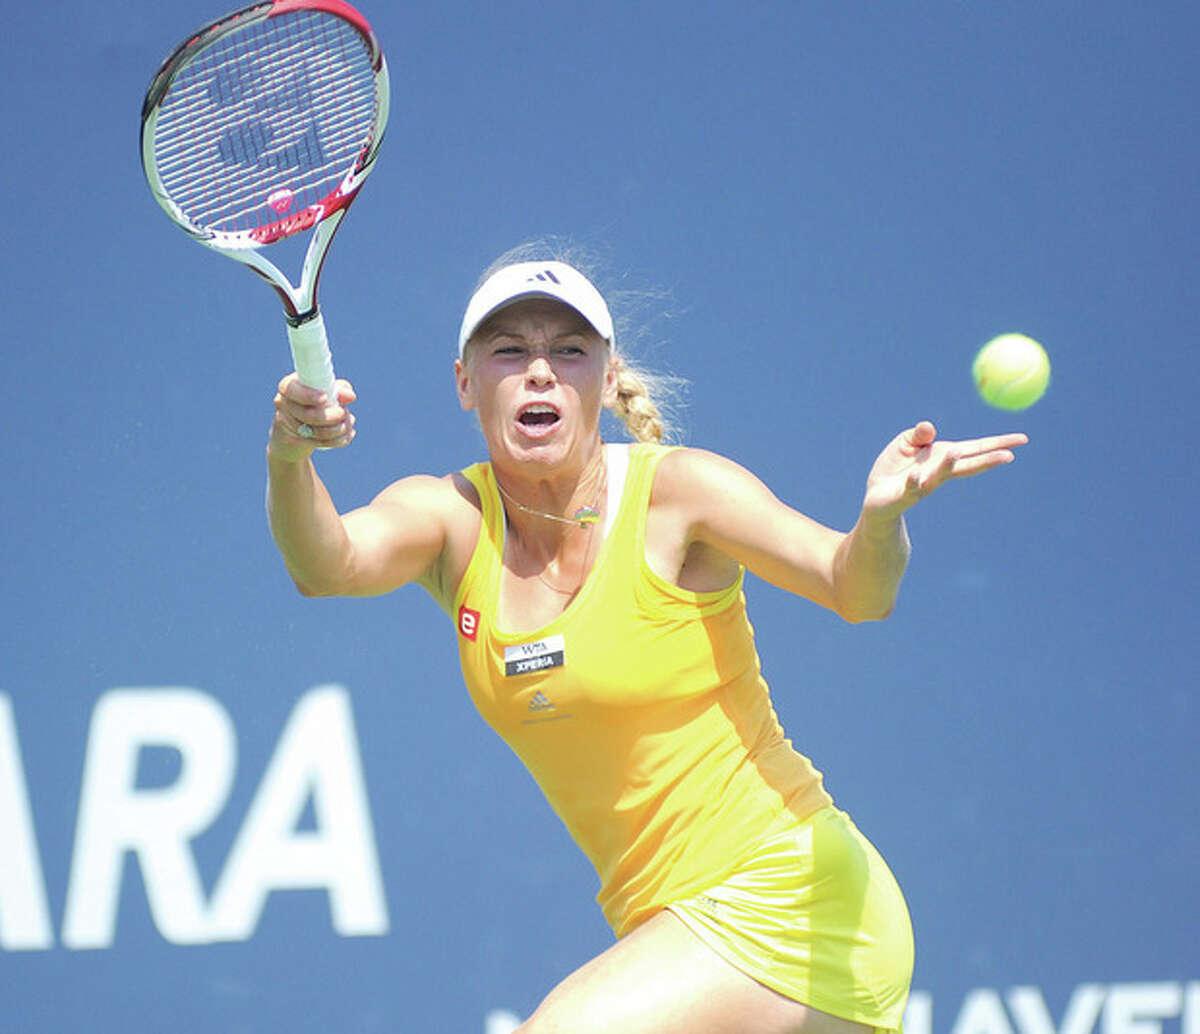 Hour photo/John Nash Denmark's Caroline Wozniacki hits a return during the second set of Thursday's 6-2, 6-1 quarterfinal win over Dominika Cibulkova at the New Haven Open at Yale.